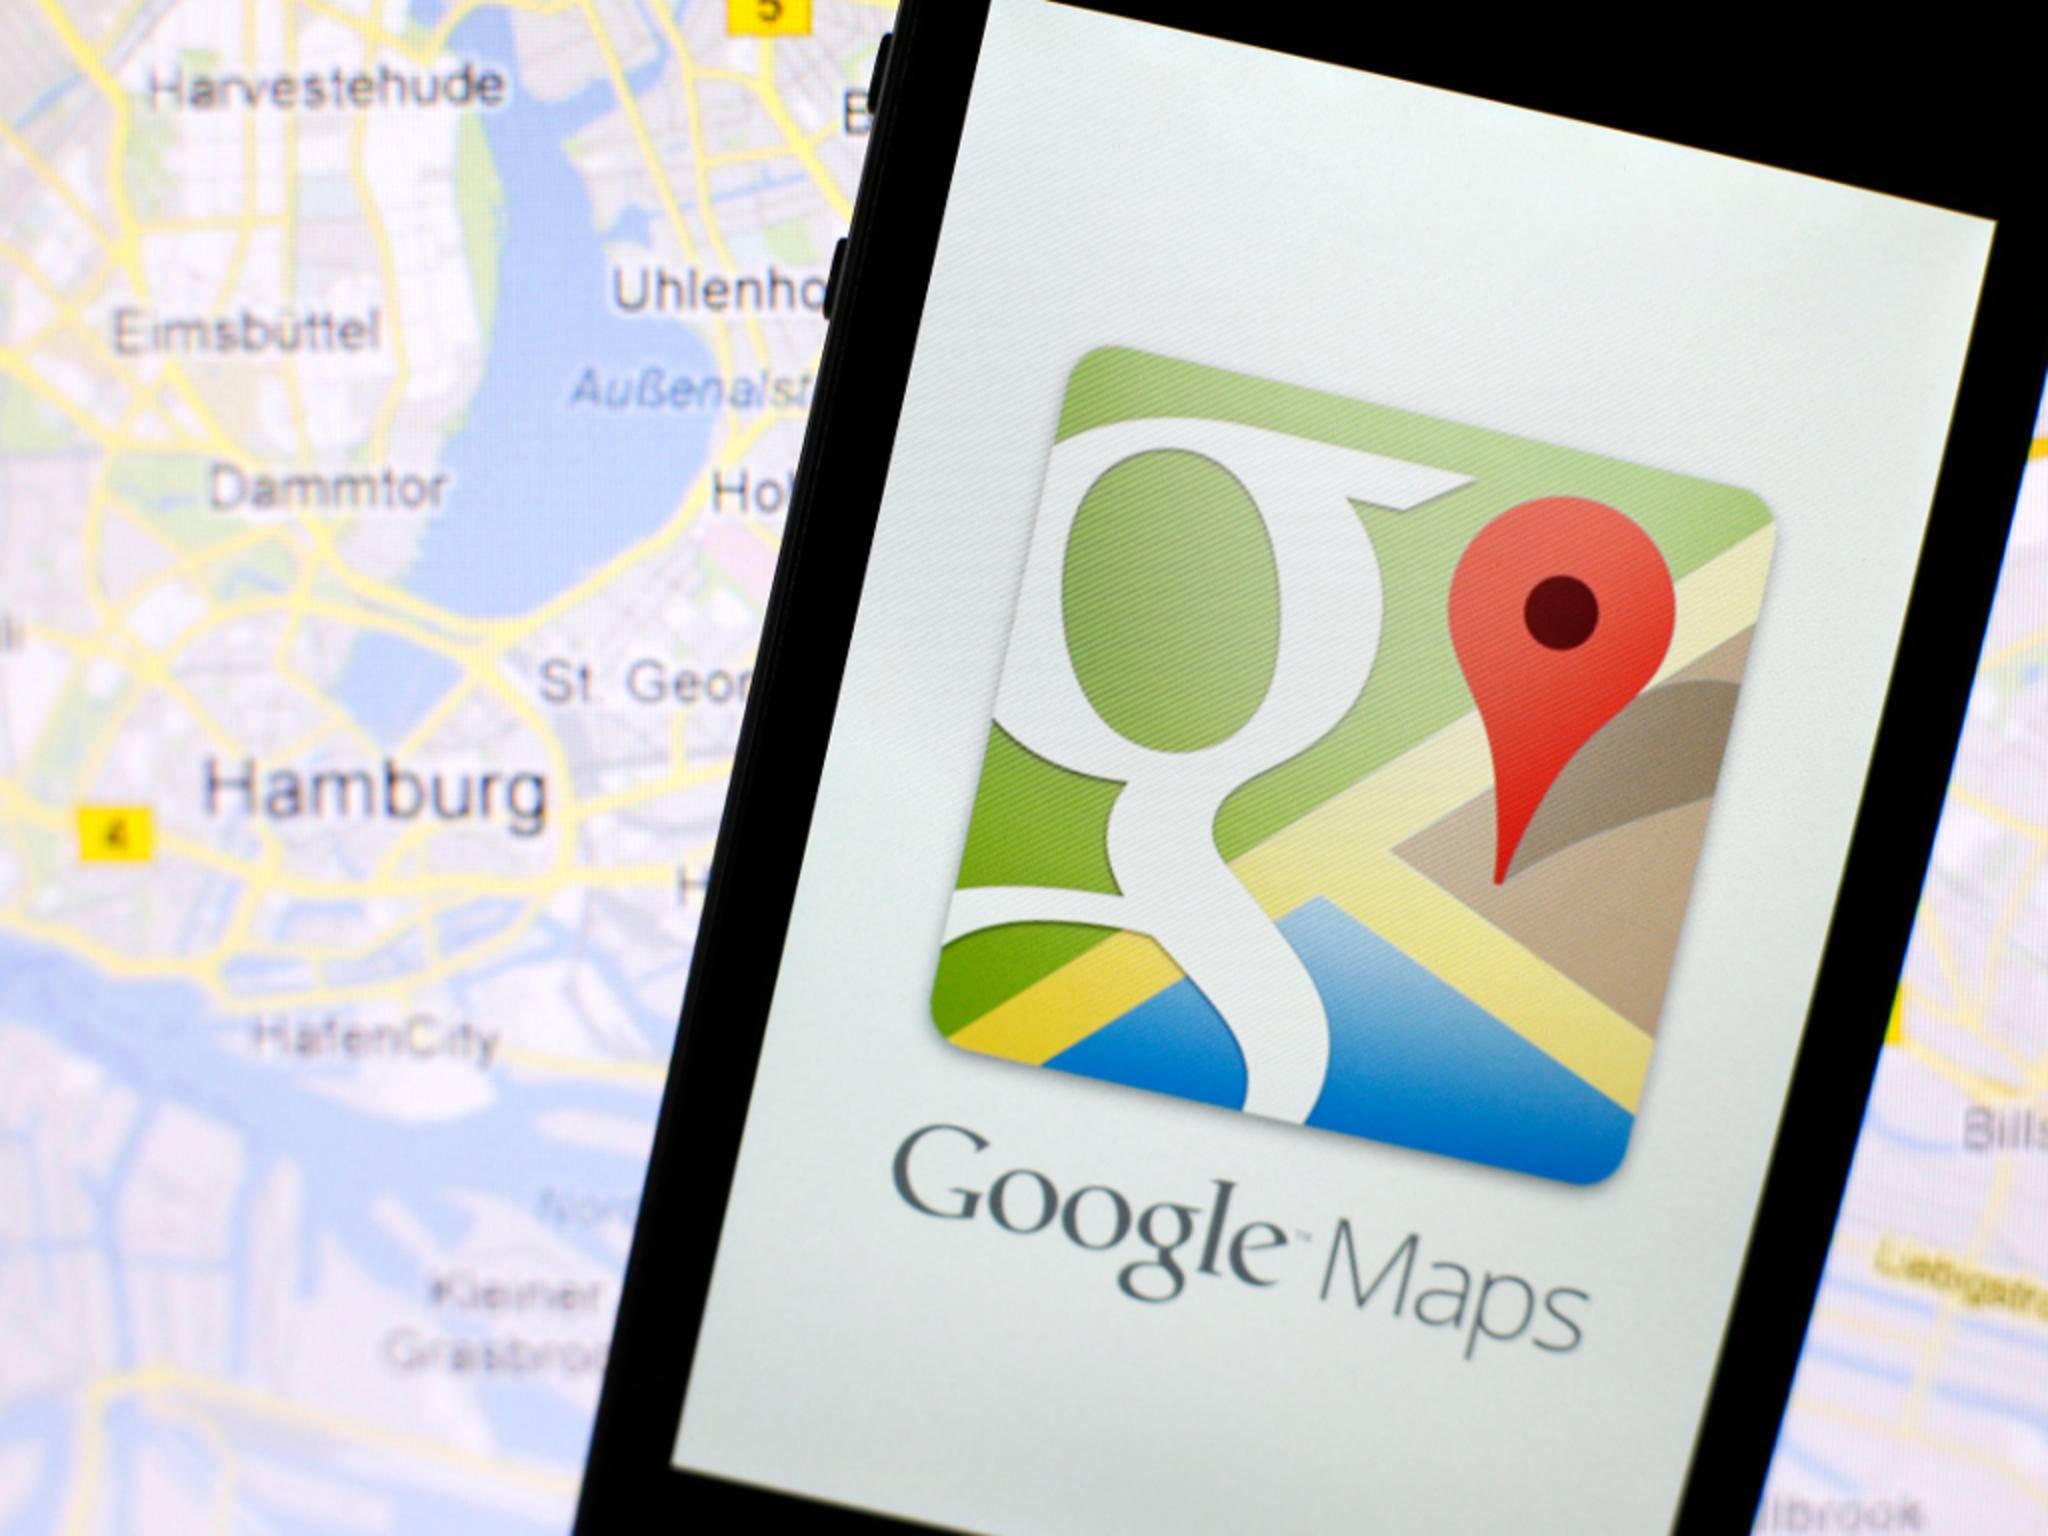 Google Maps auf dem iPhme